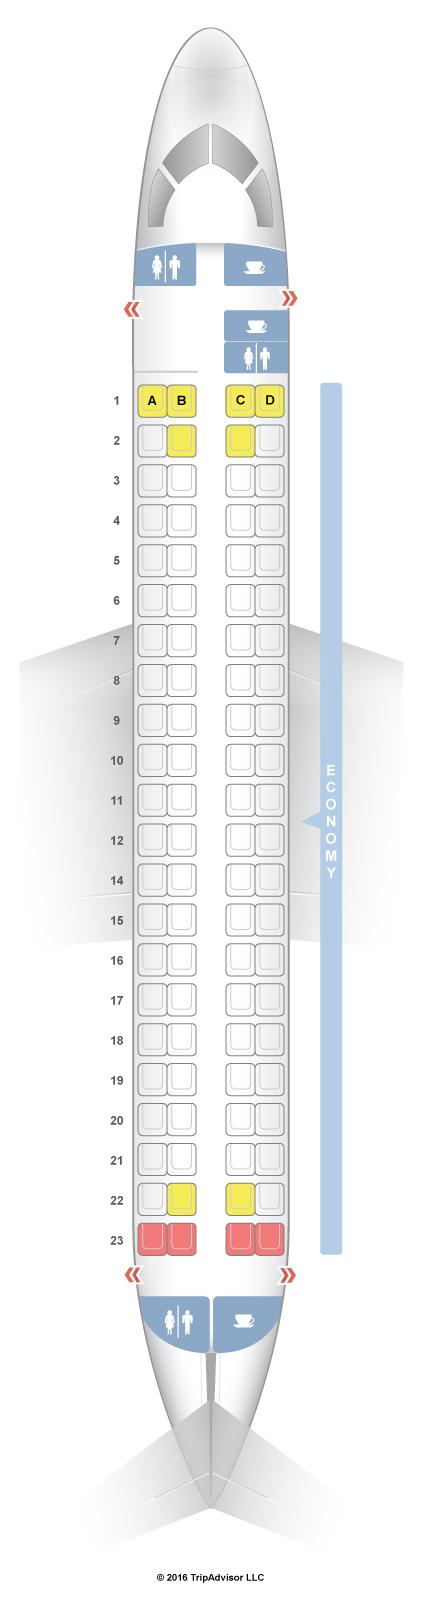 SeatGuru Seat Map FlyBE Embraer 175 (E75) SeatGuru